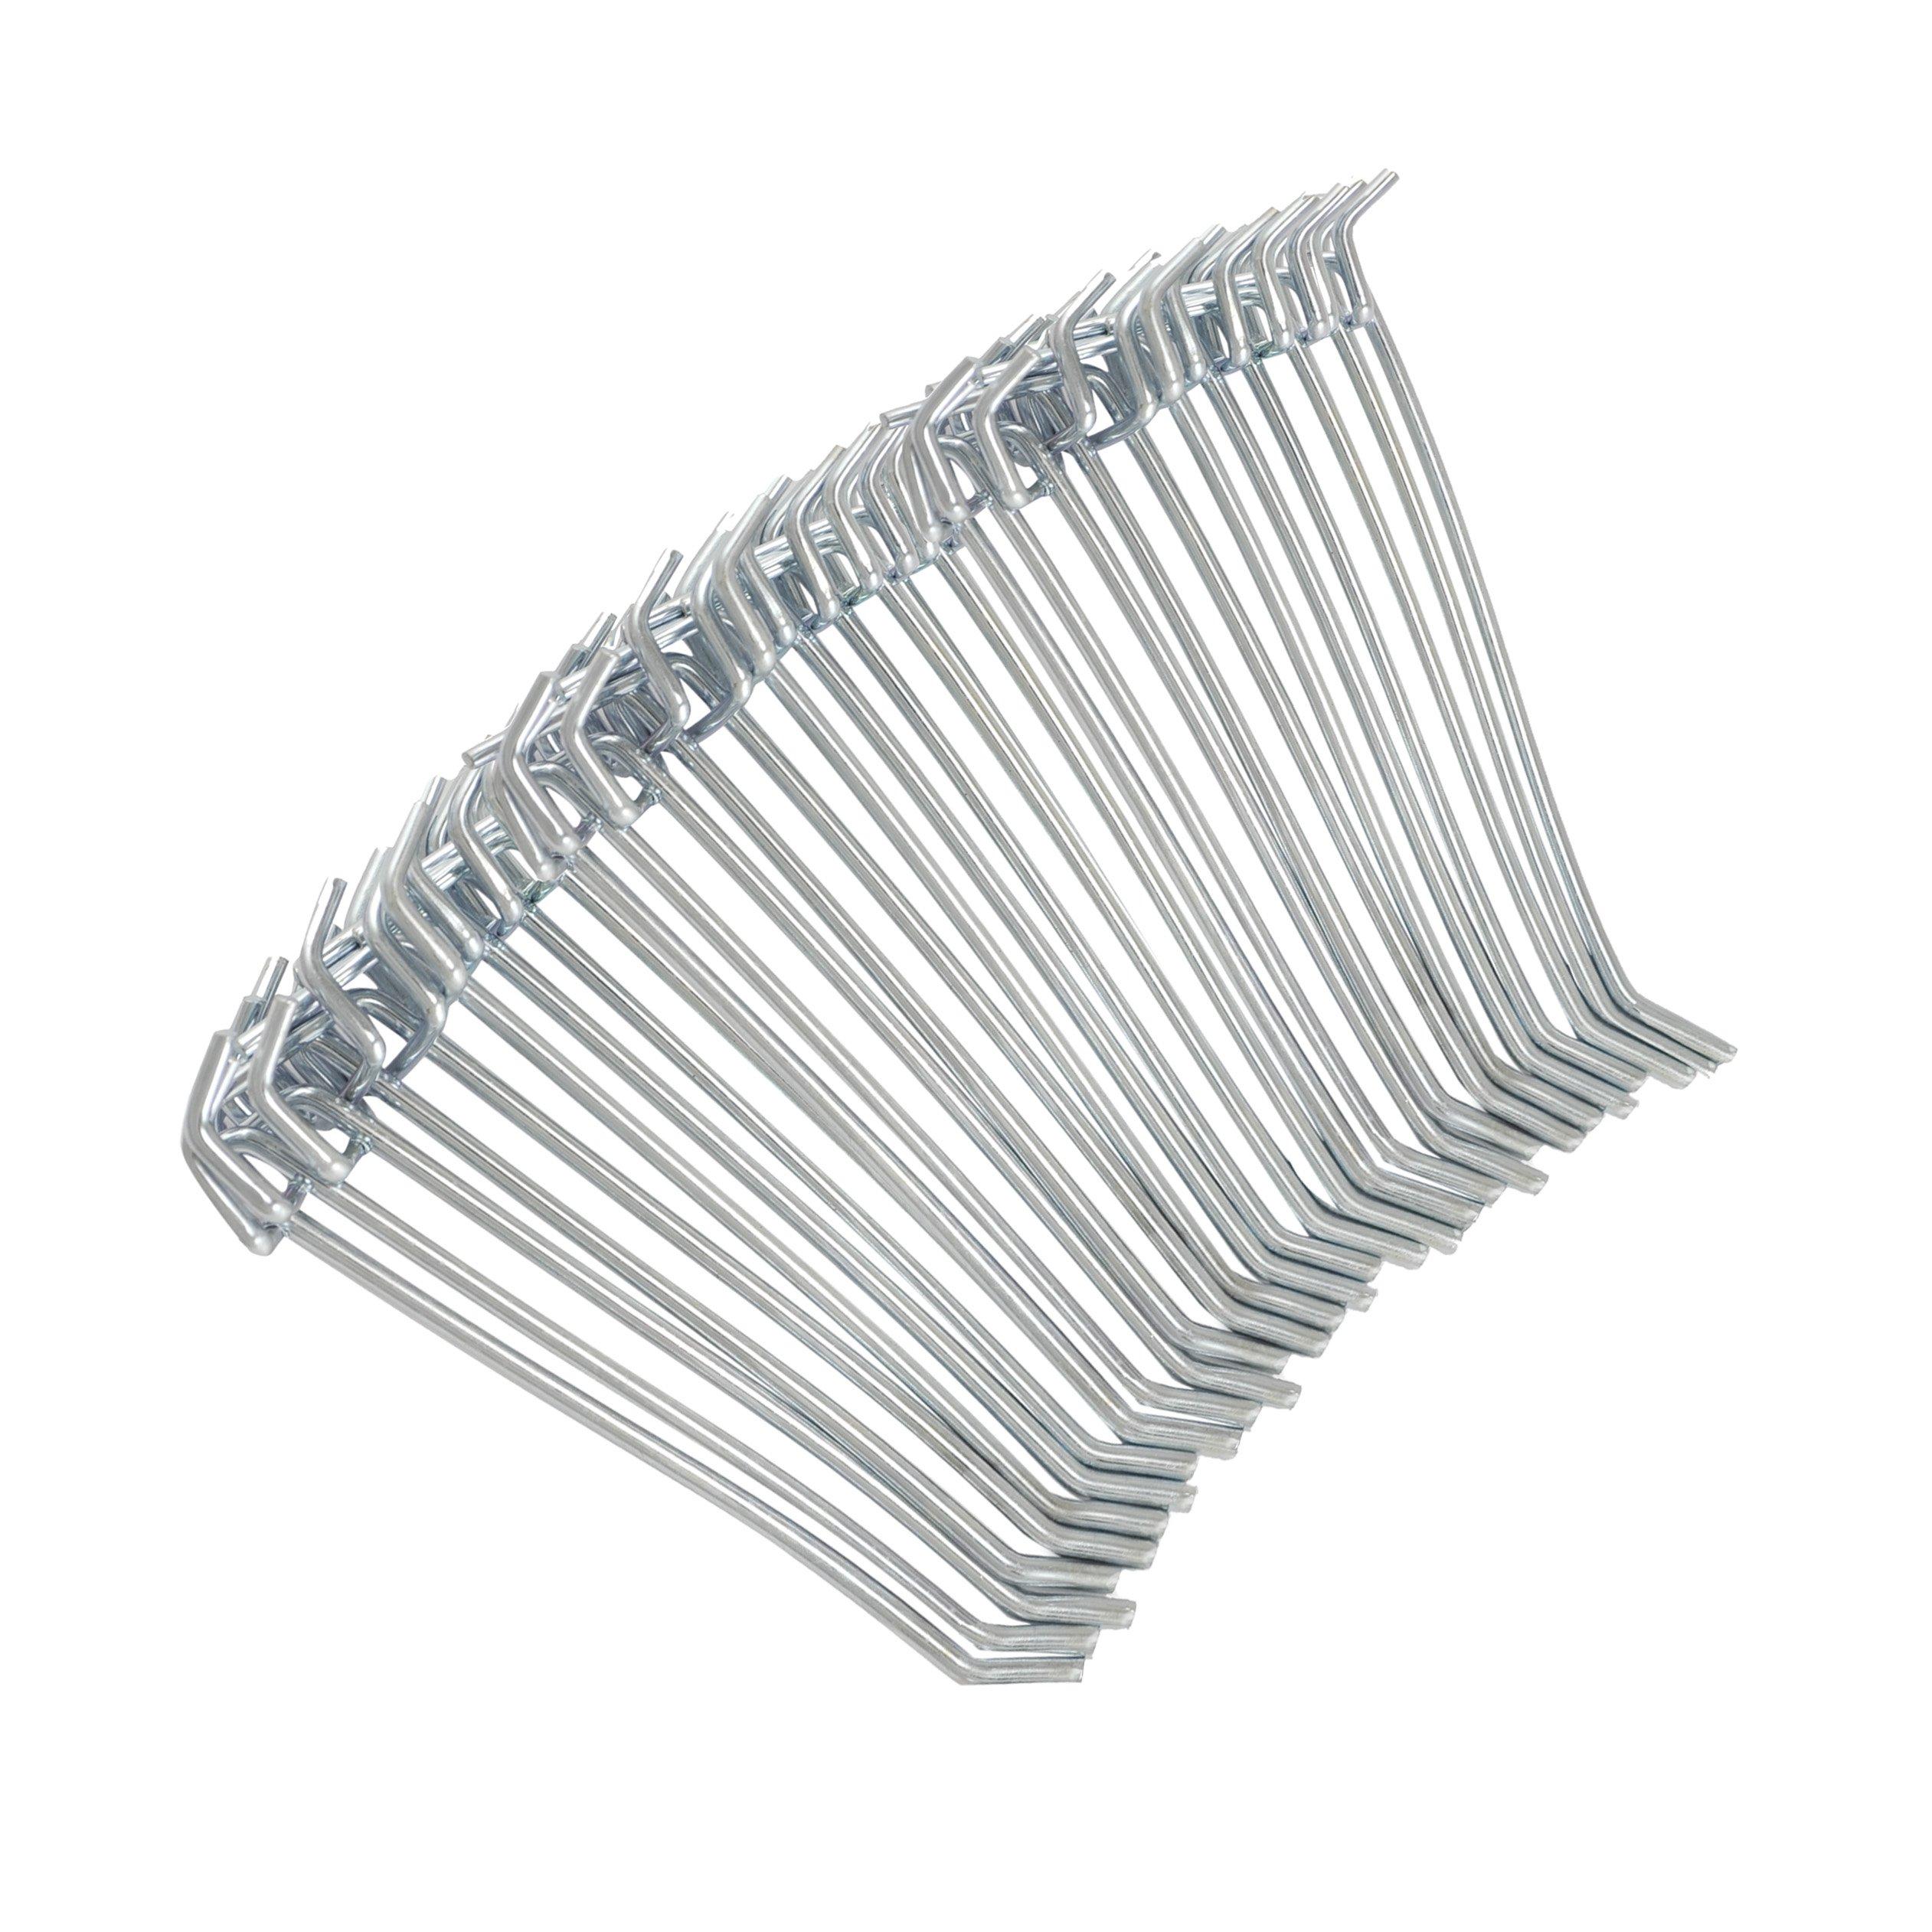 4 Metal Pegboard Hooks 50 Piece Pack Peg Hooks For 1 8 Amp 1 4 Storage Organizer